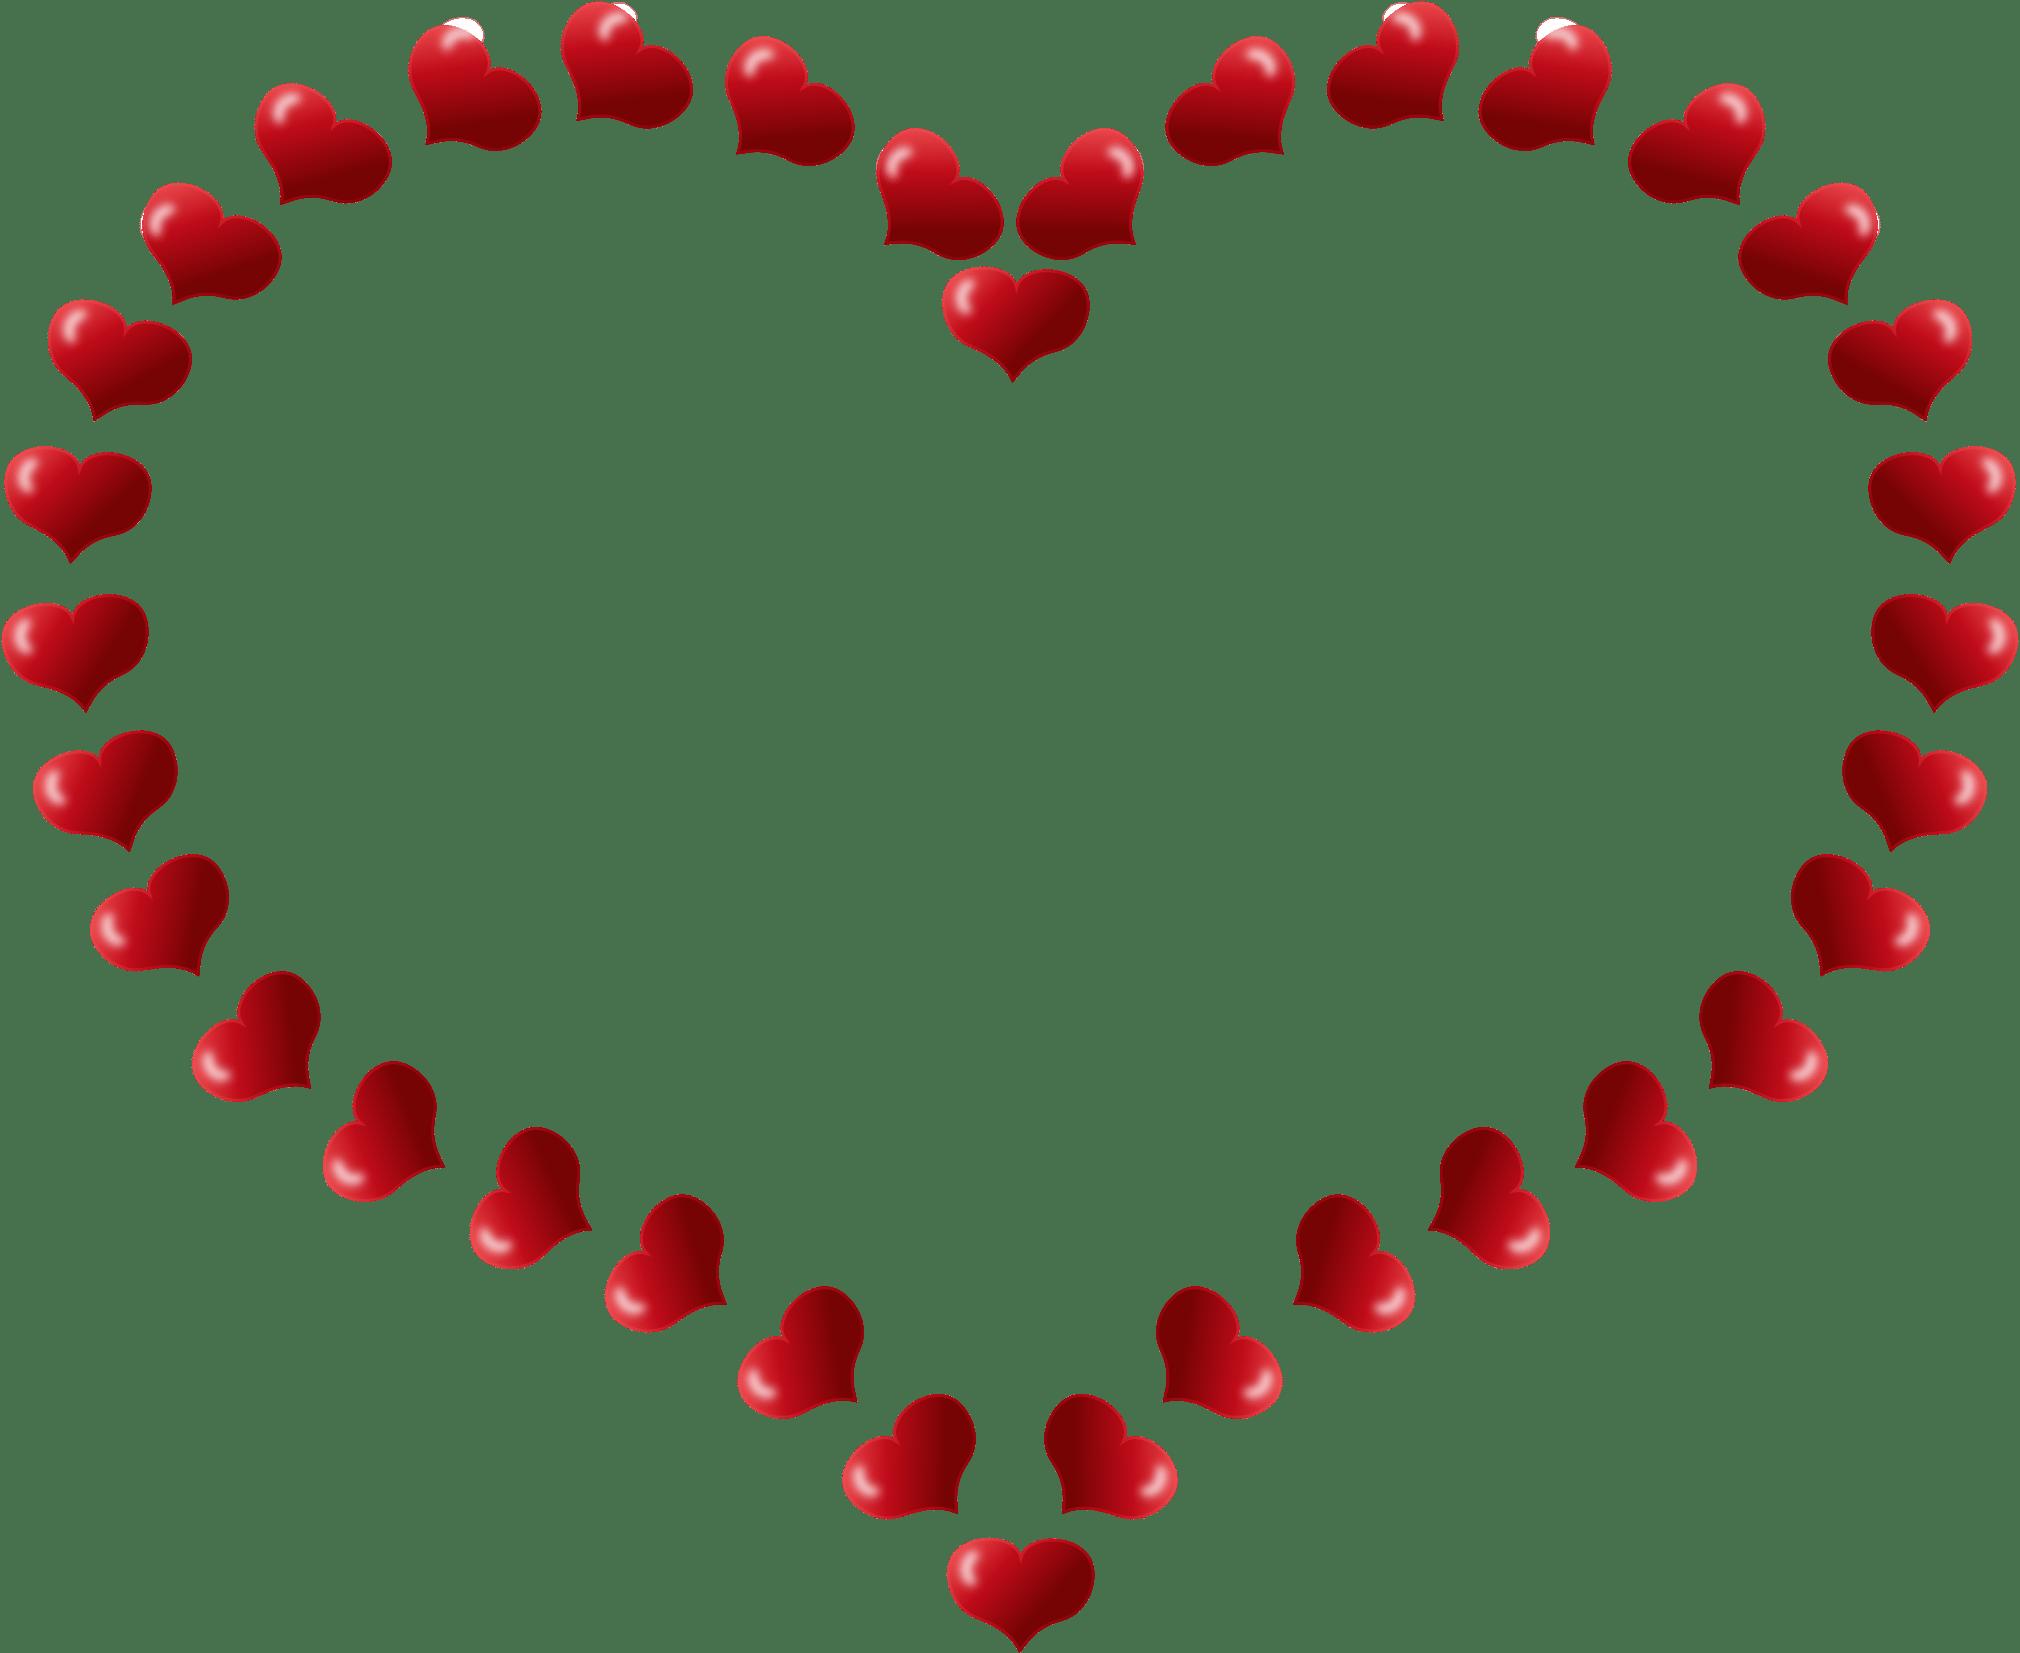 Fire heart clipart clip art download Heart Outline on Fire transparent PNG - StickPNG clip art download